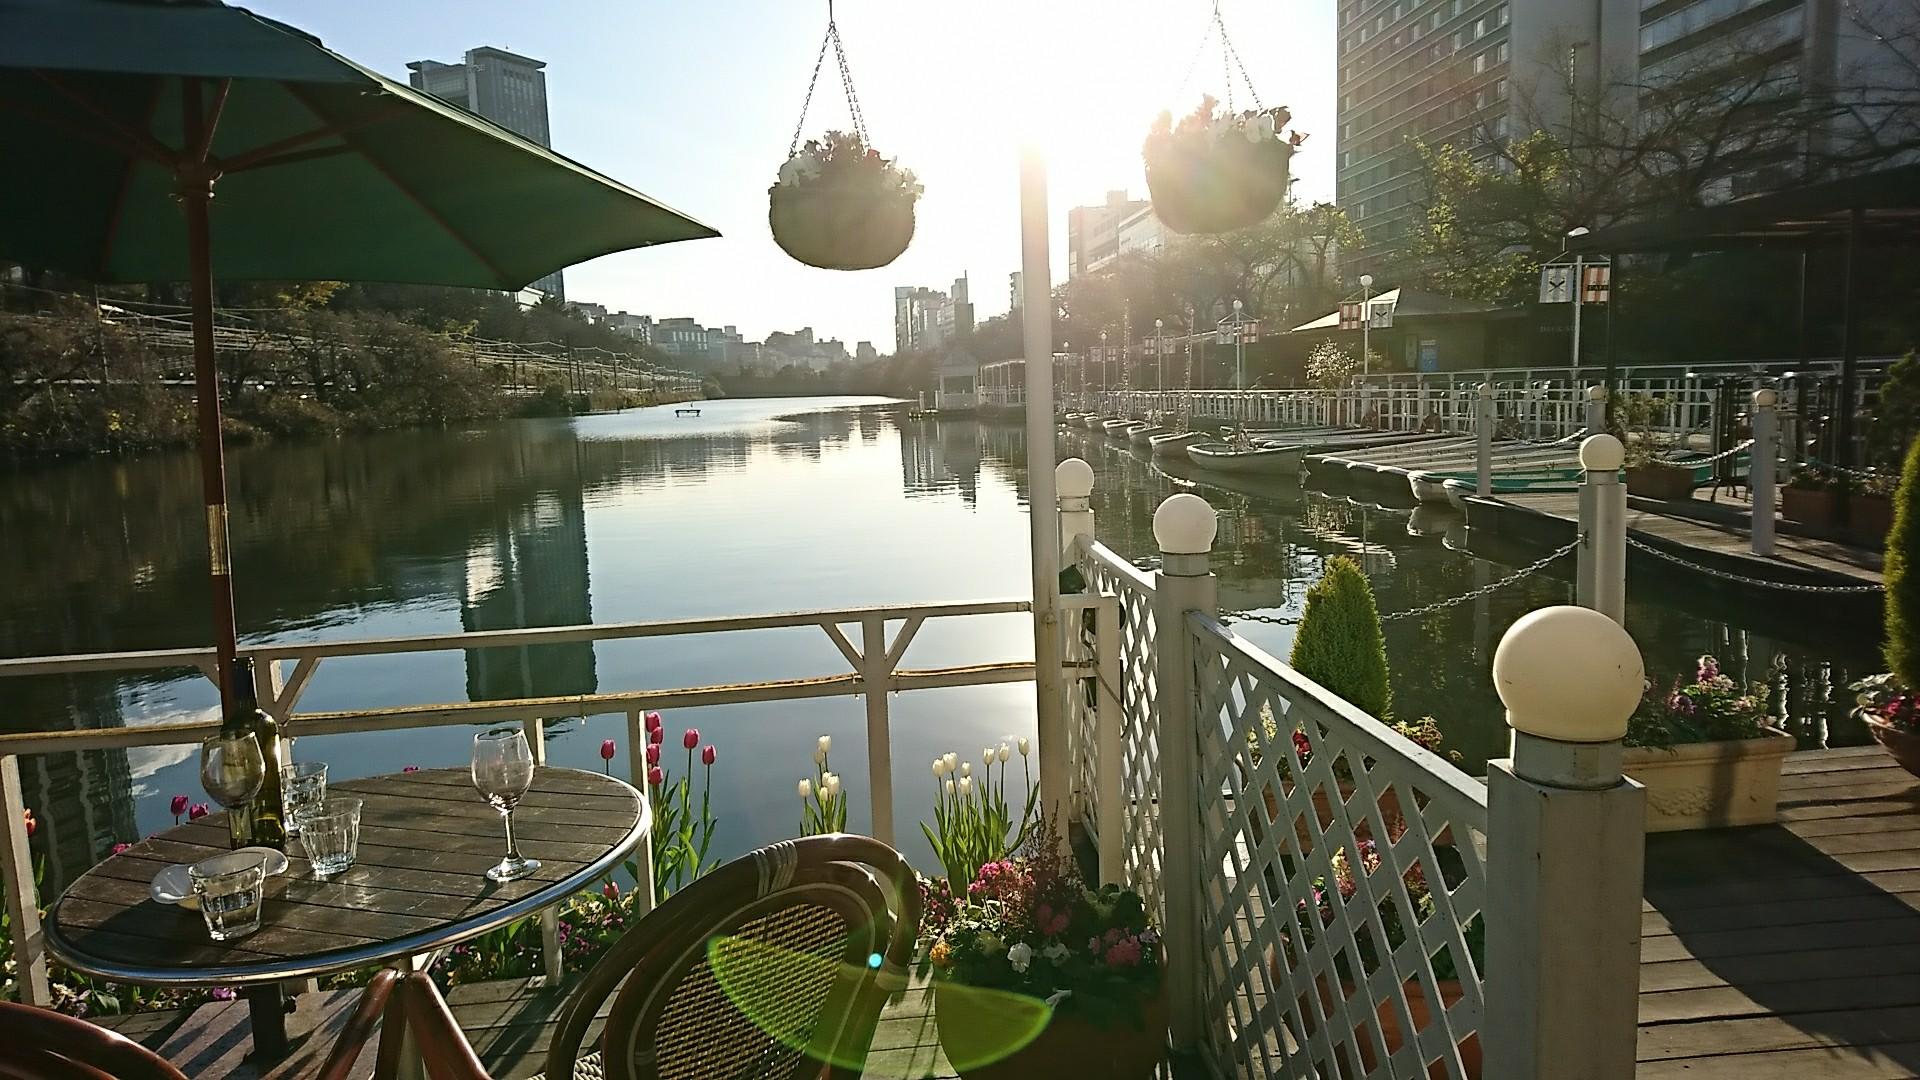 f:id:sunflower-shigeaki:20171231162745j:image